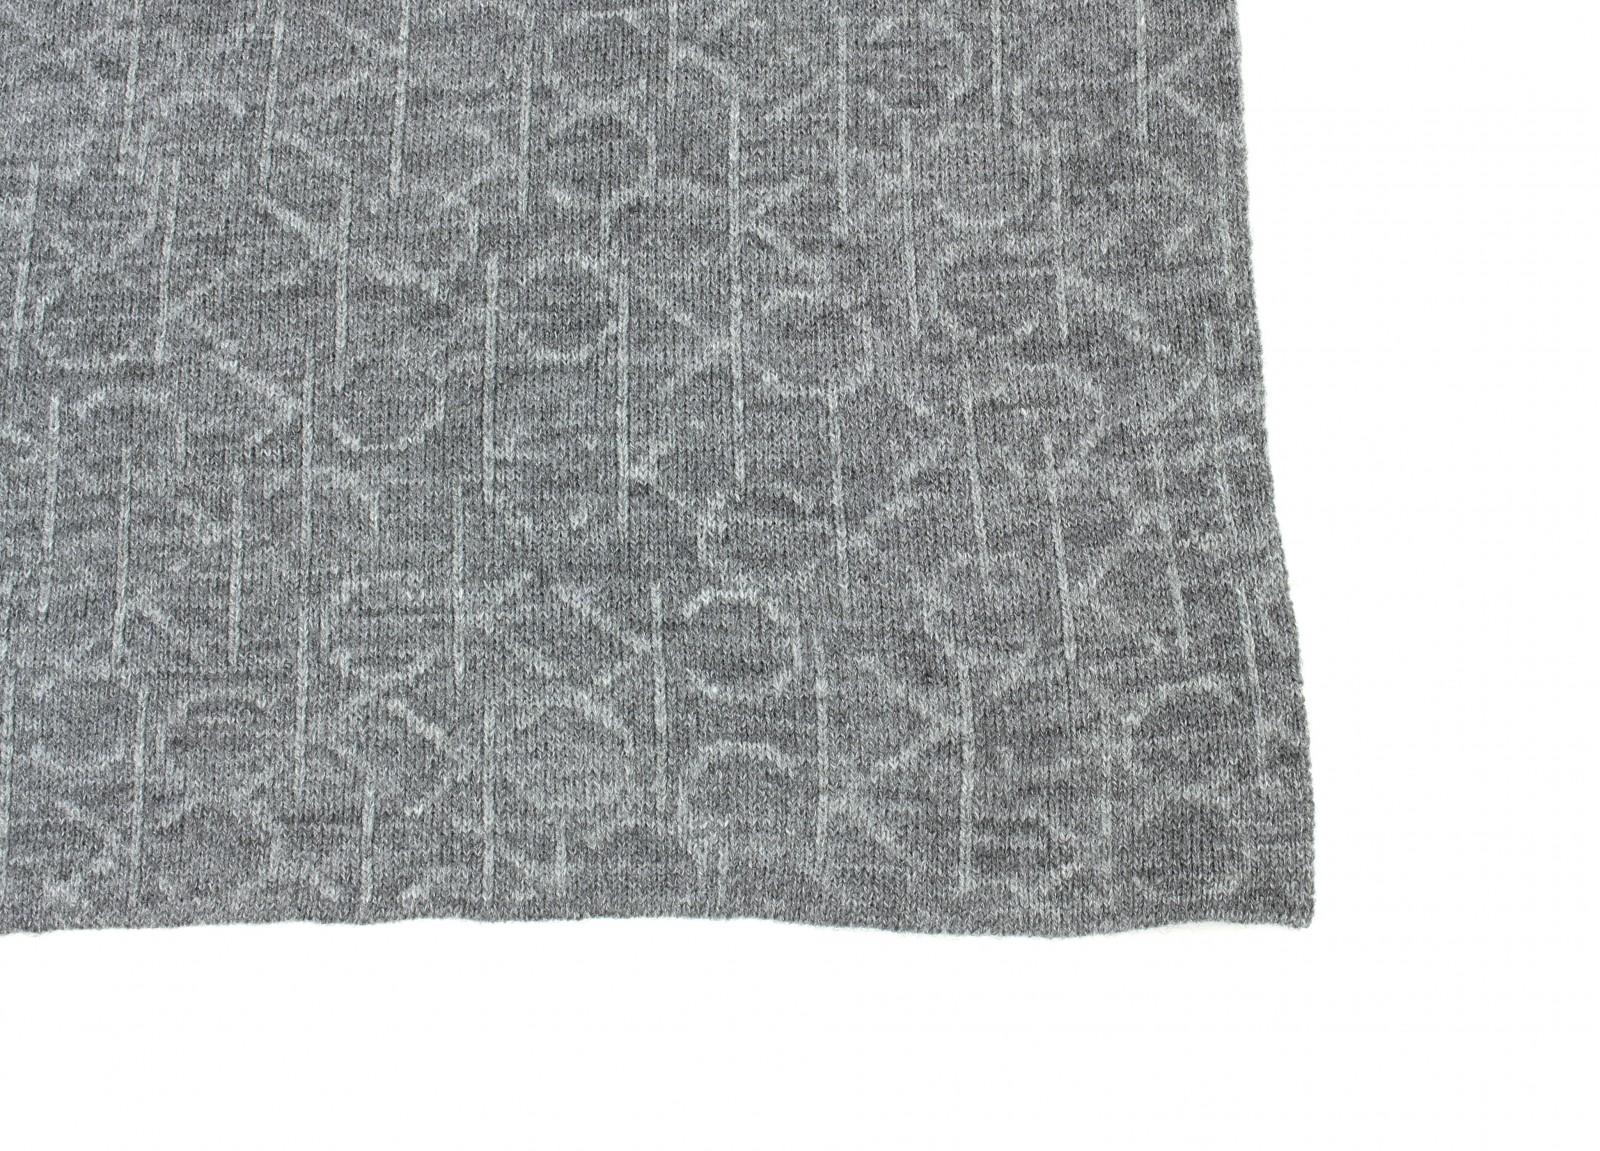 calvin klein shawl m tze gift set power logo abyss. Black Bedroom Furniture Sets. Home Design Ideas